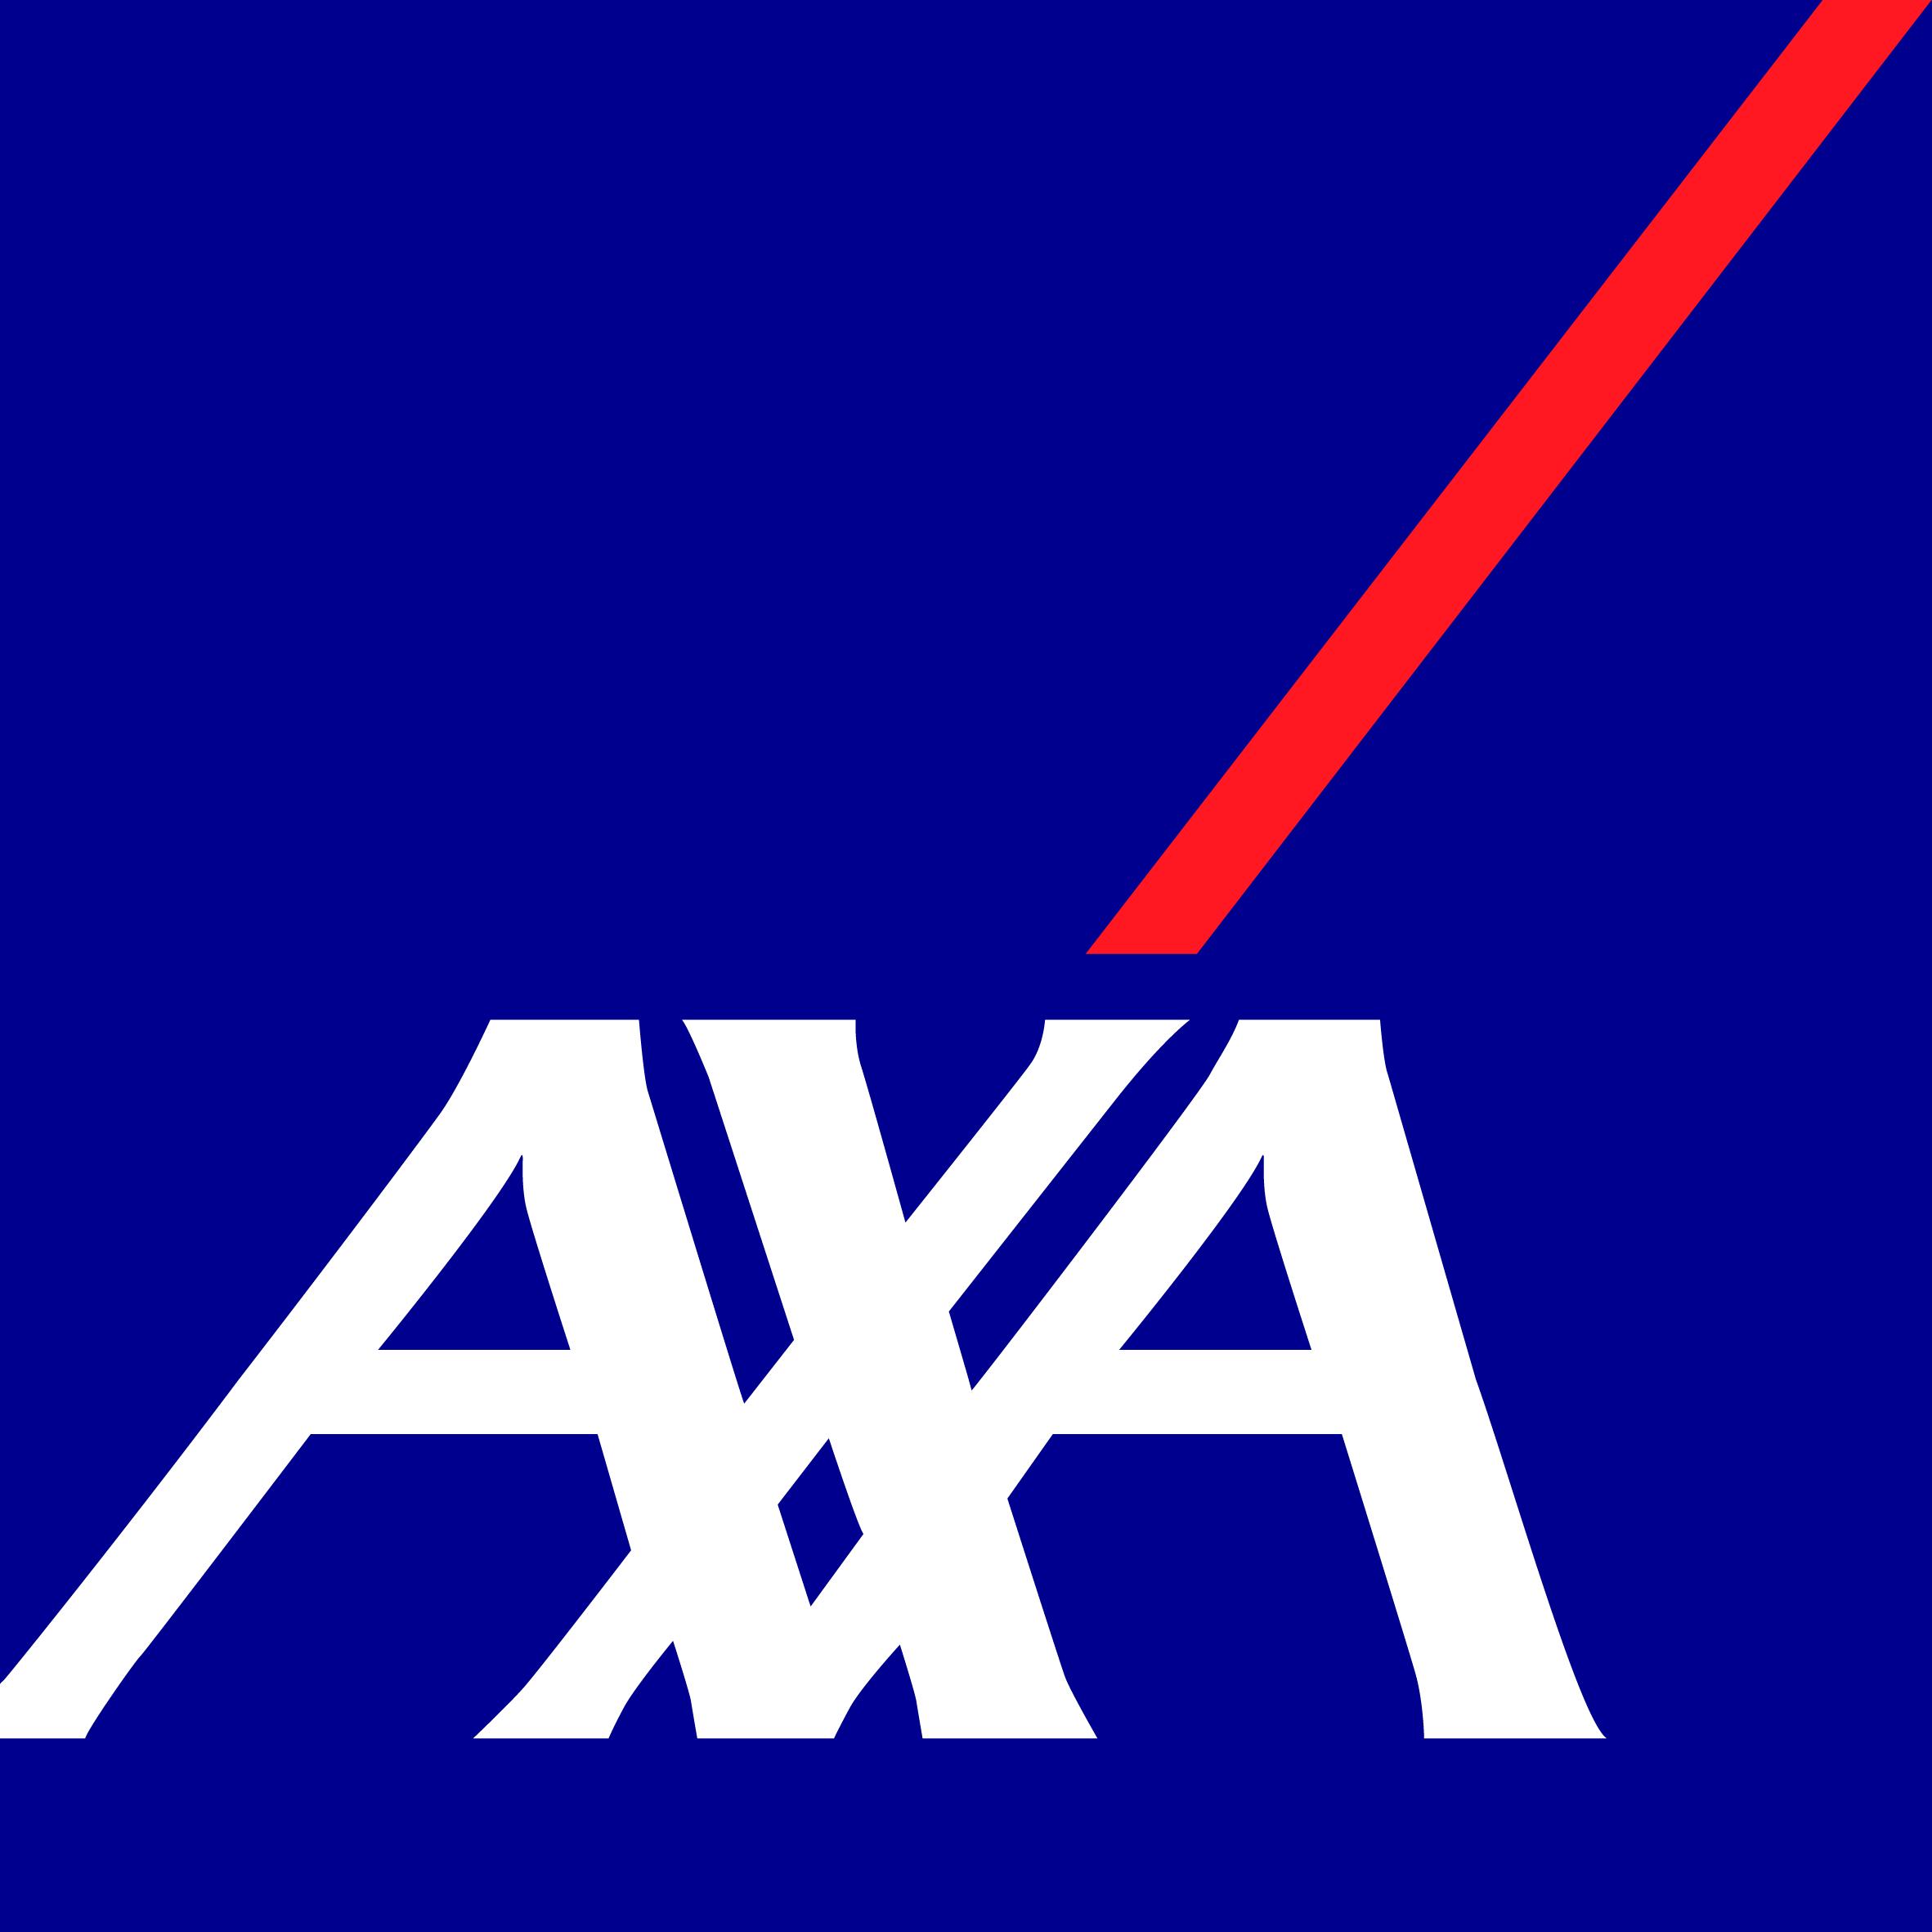 AXA Art Prize 2019 Exhibition